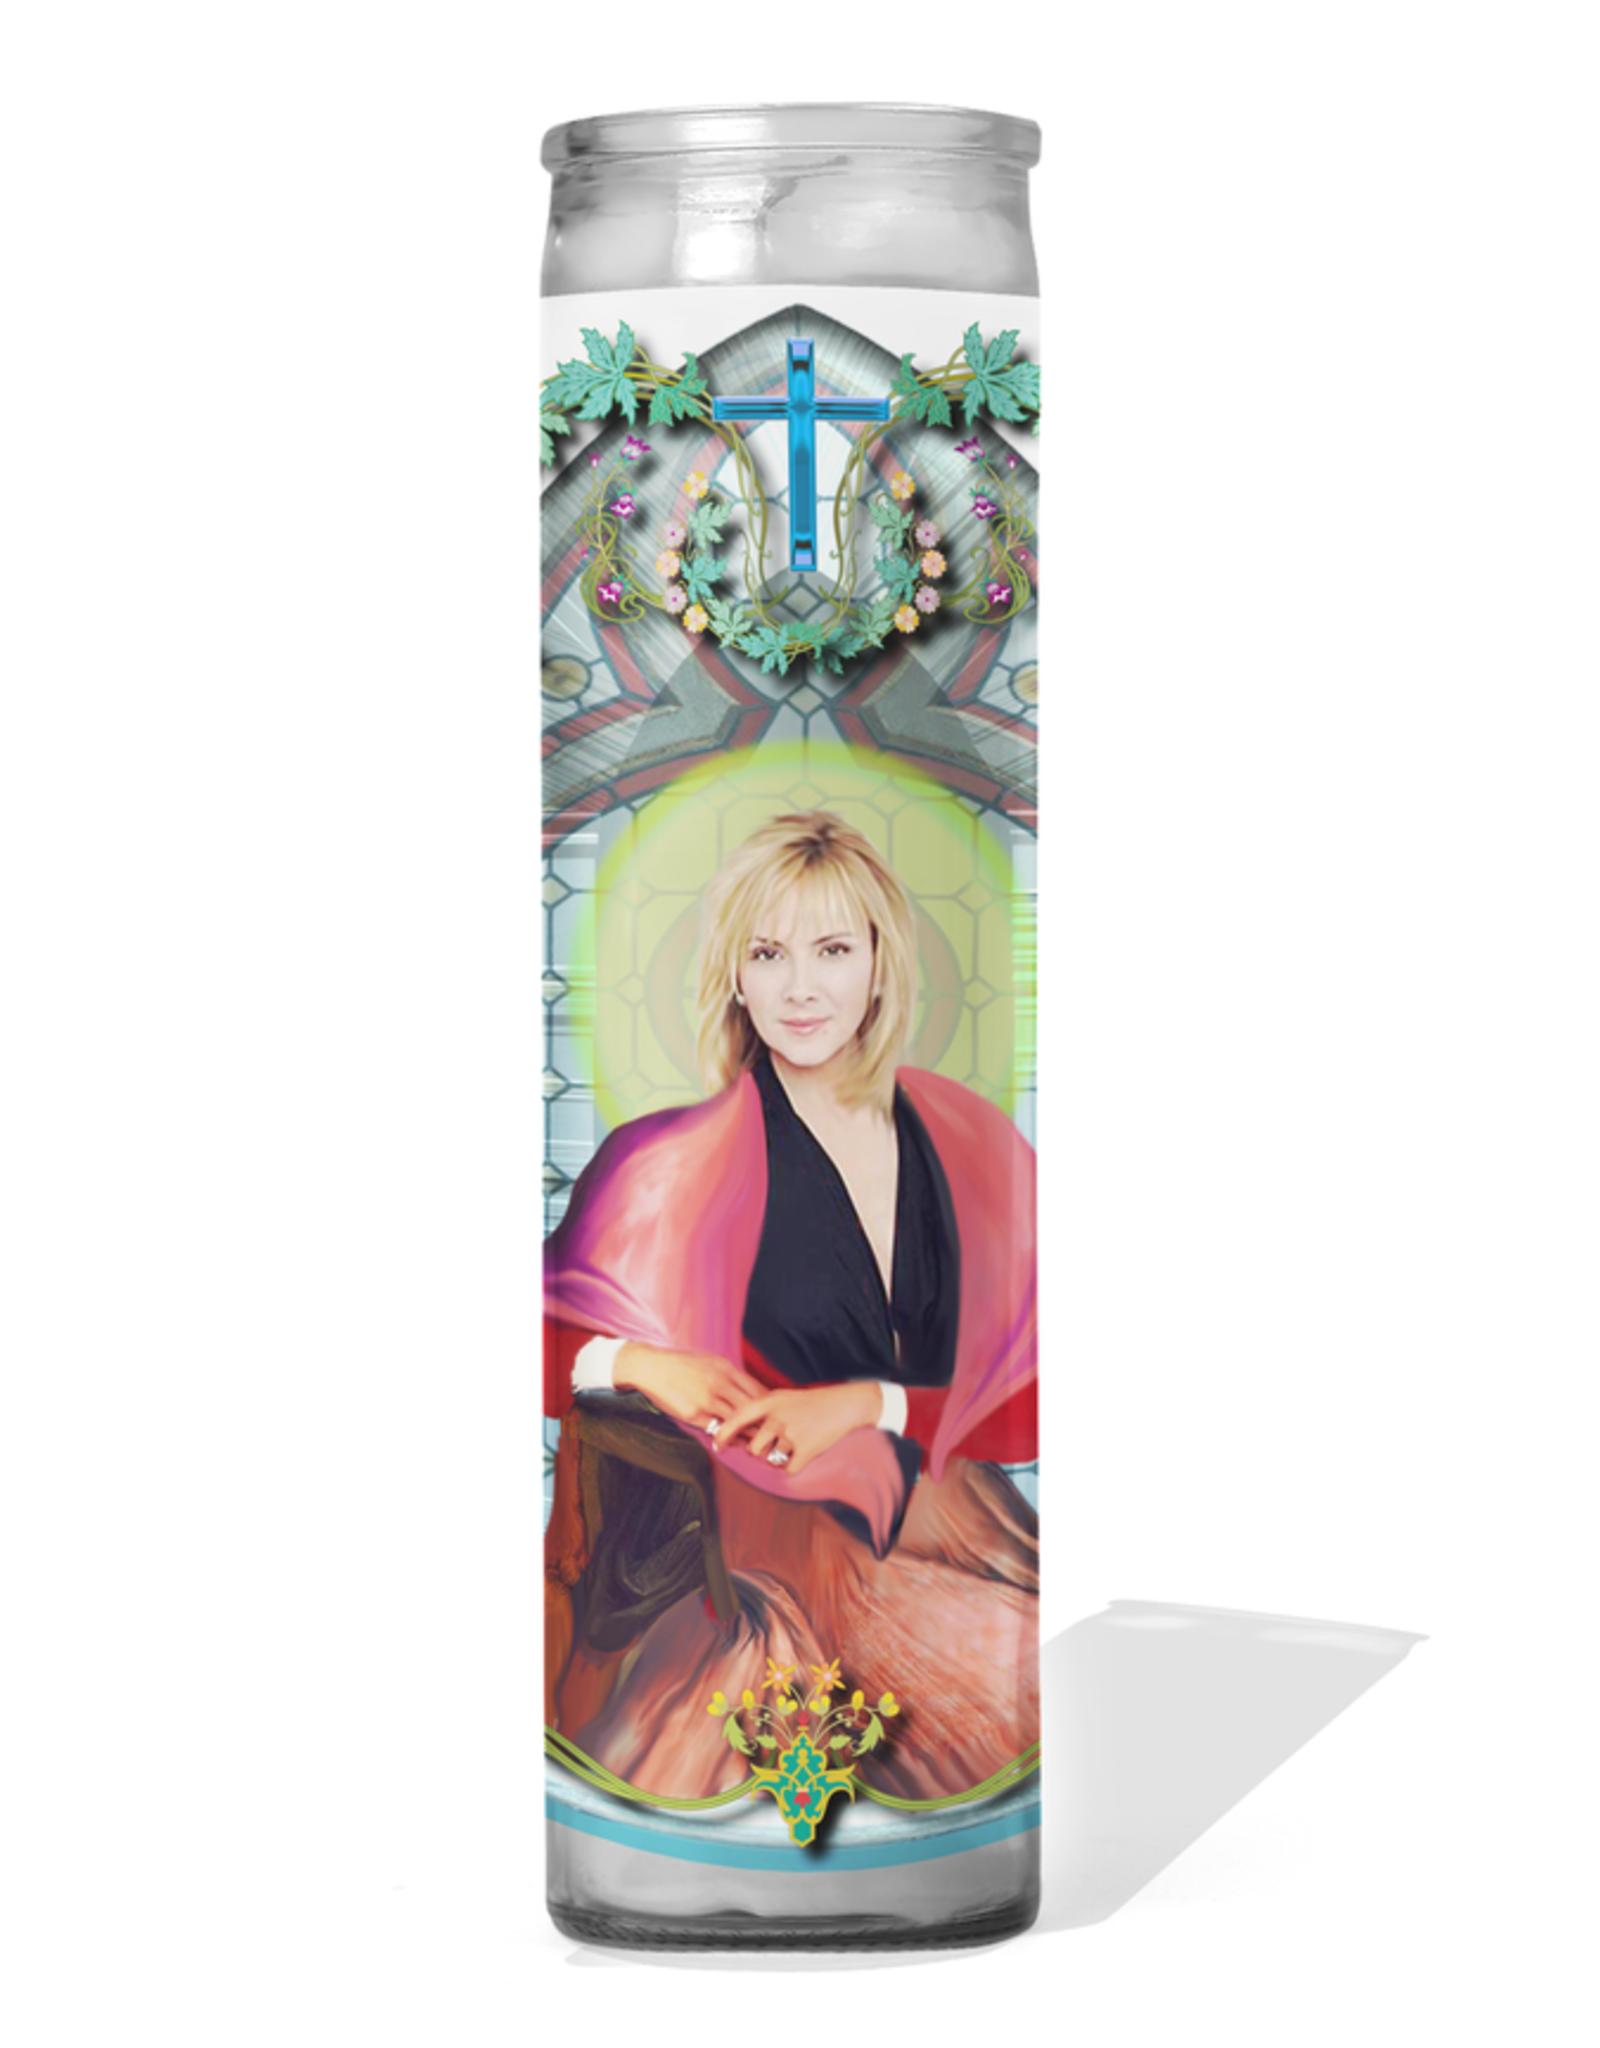 CDC Samantha Jones Prayer Candle